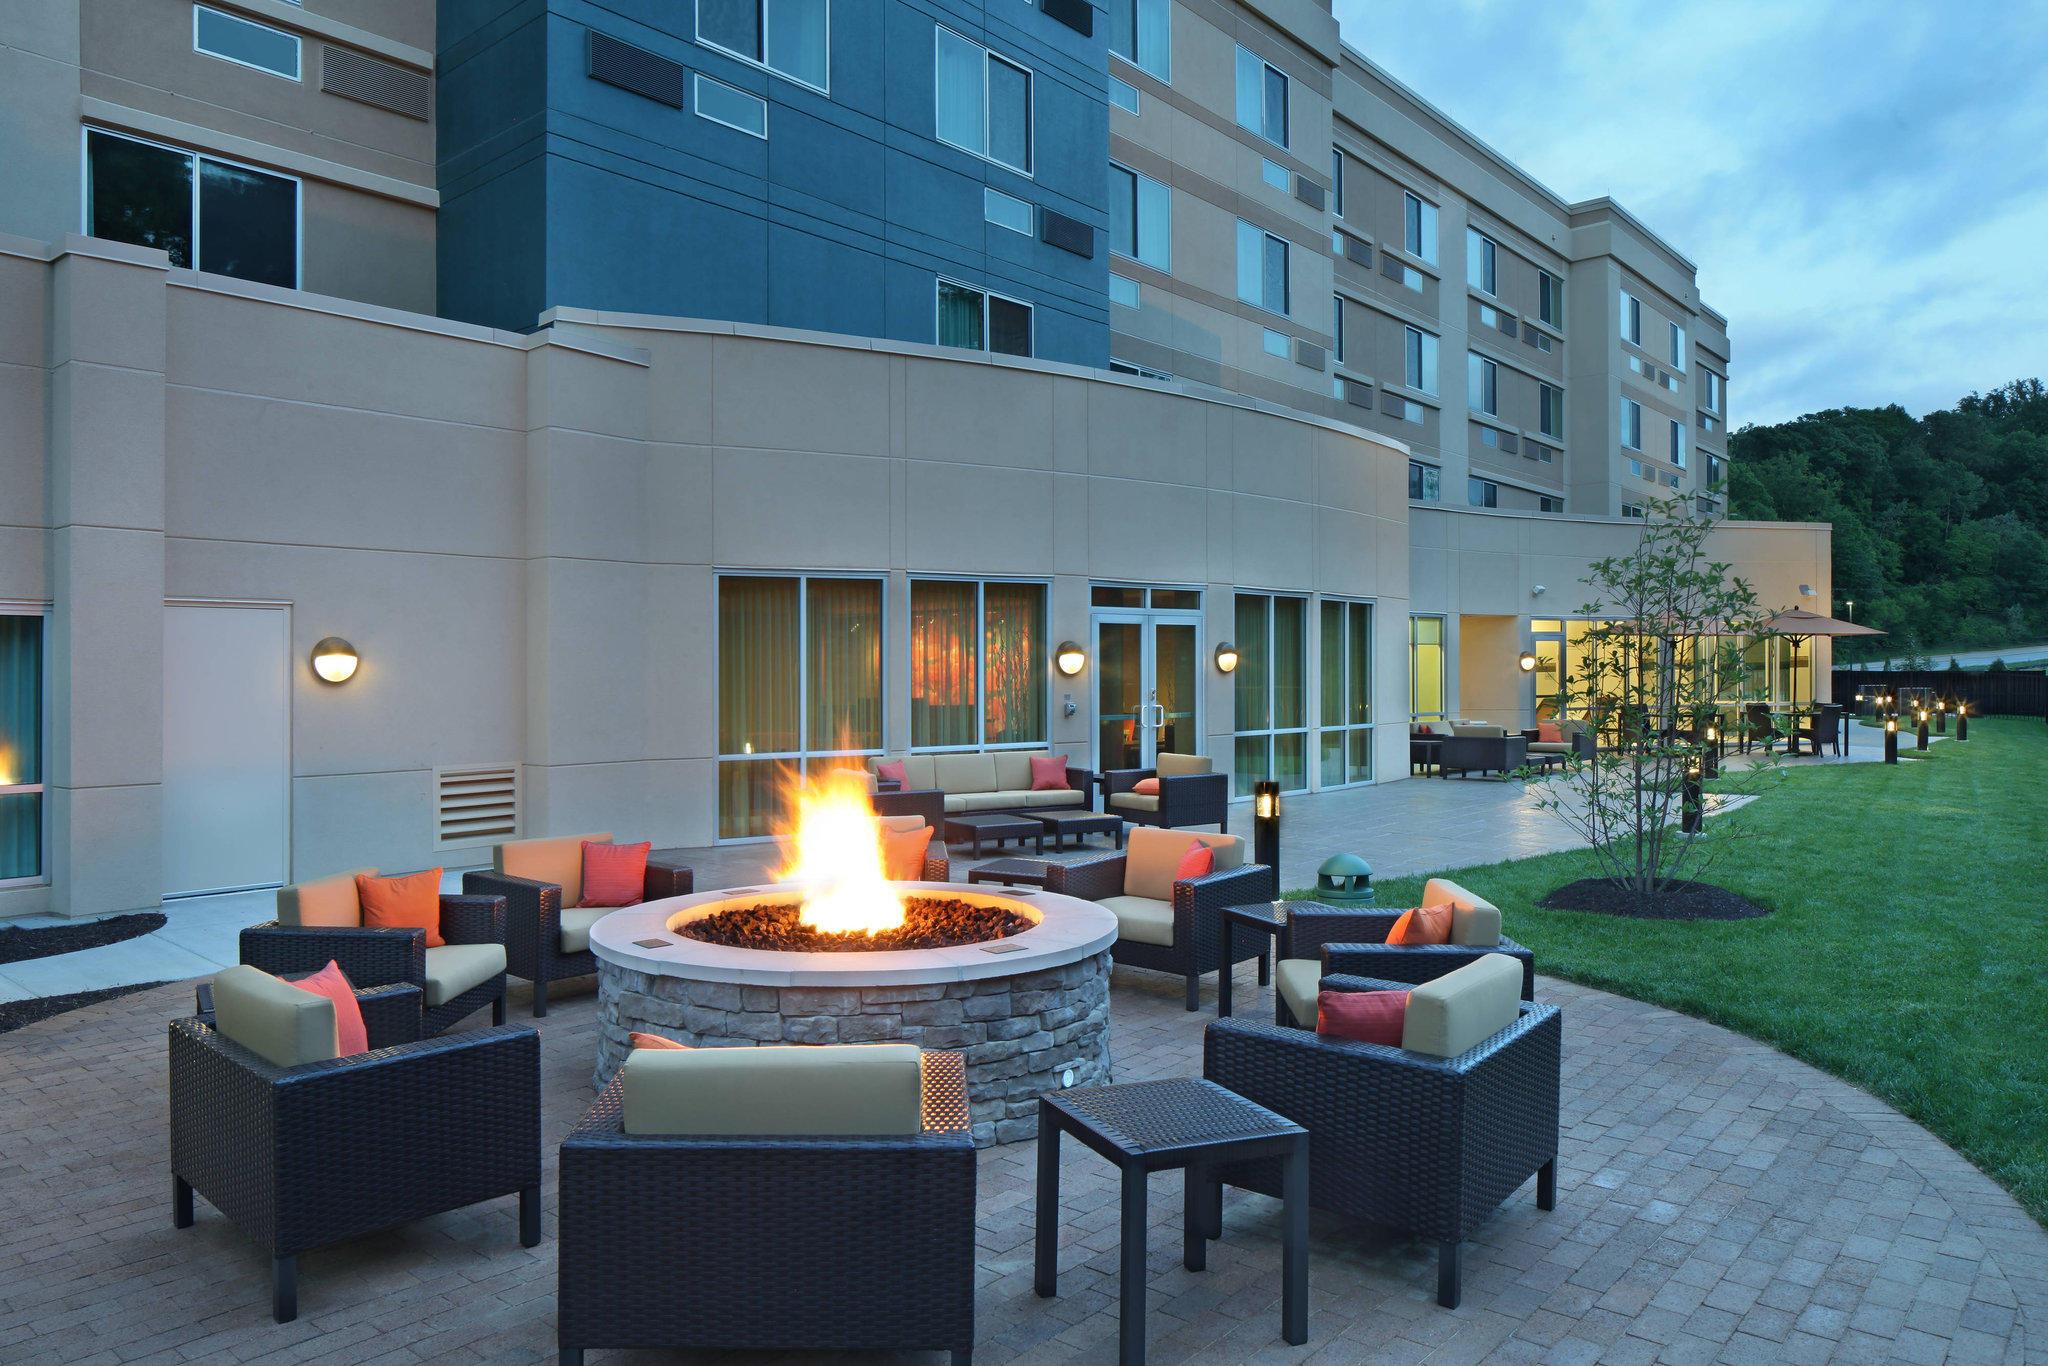 Courtyard by Marriott Philadelphia Coatesville/Exton